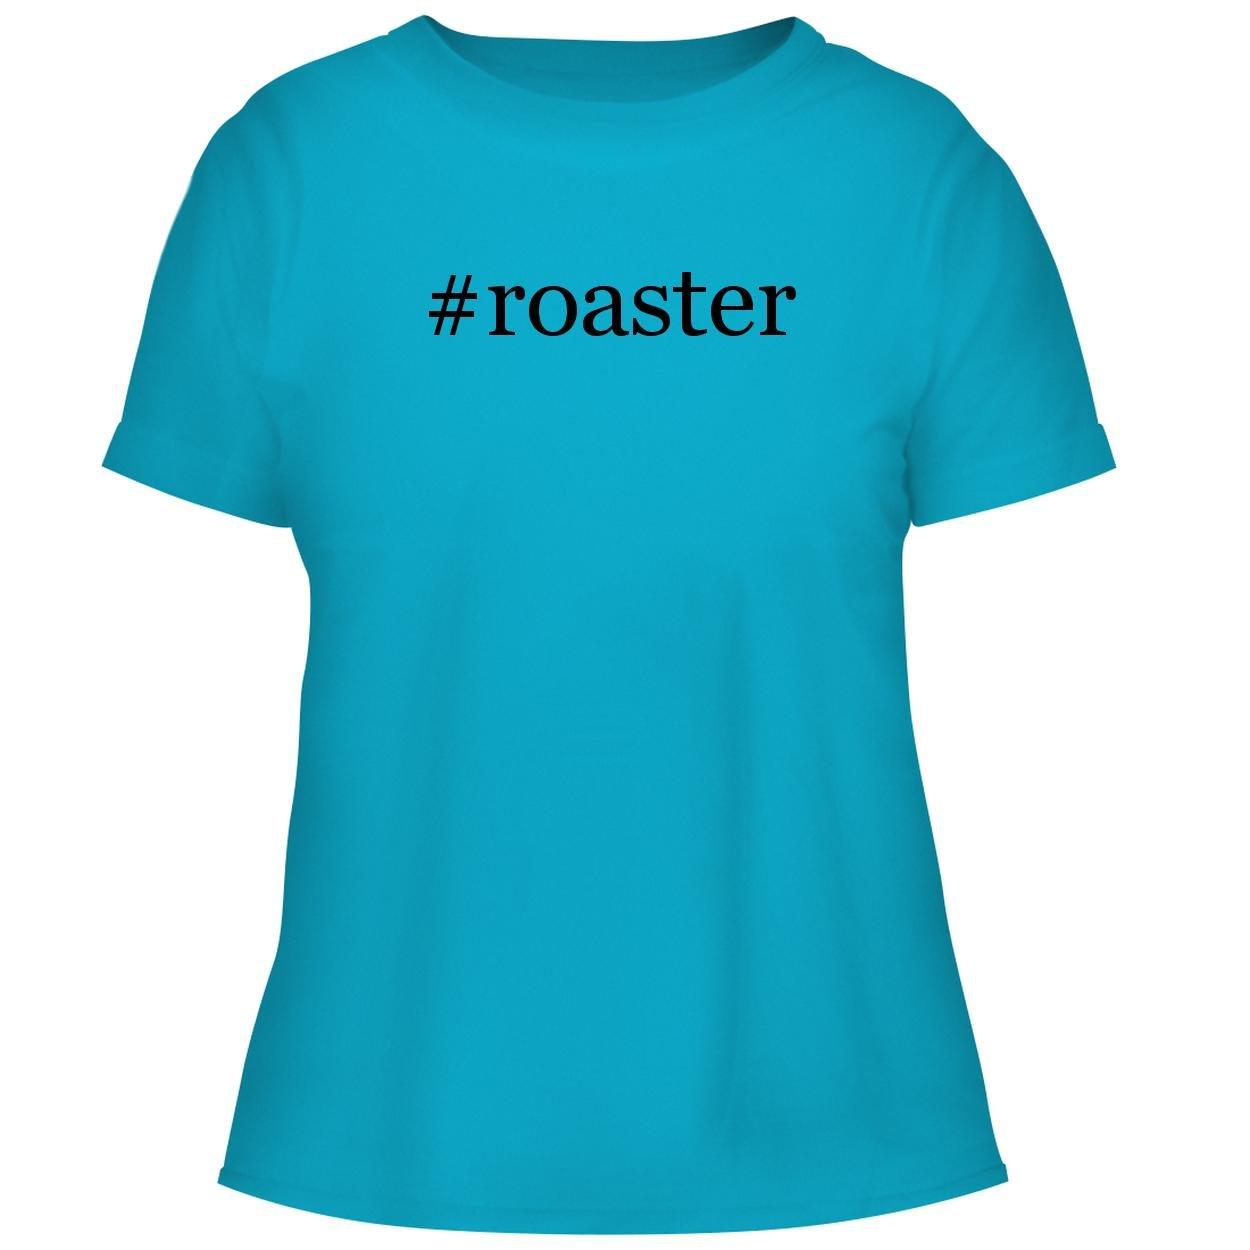 BH Cool Designs #Roaster - Cute Women